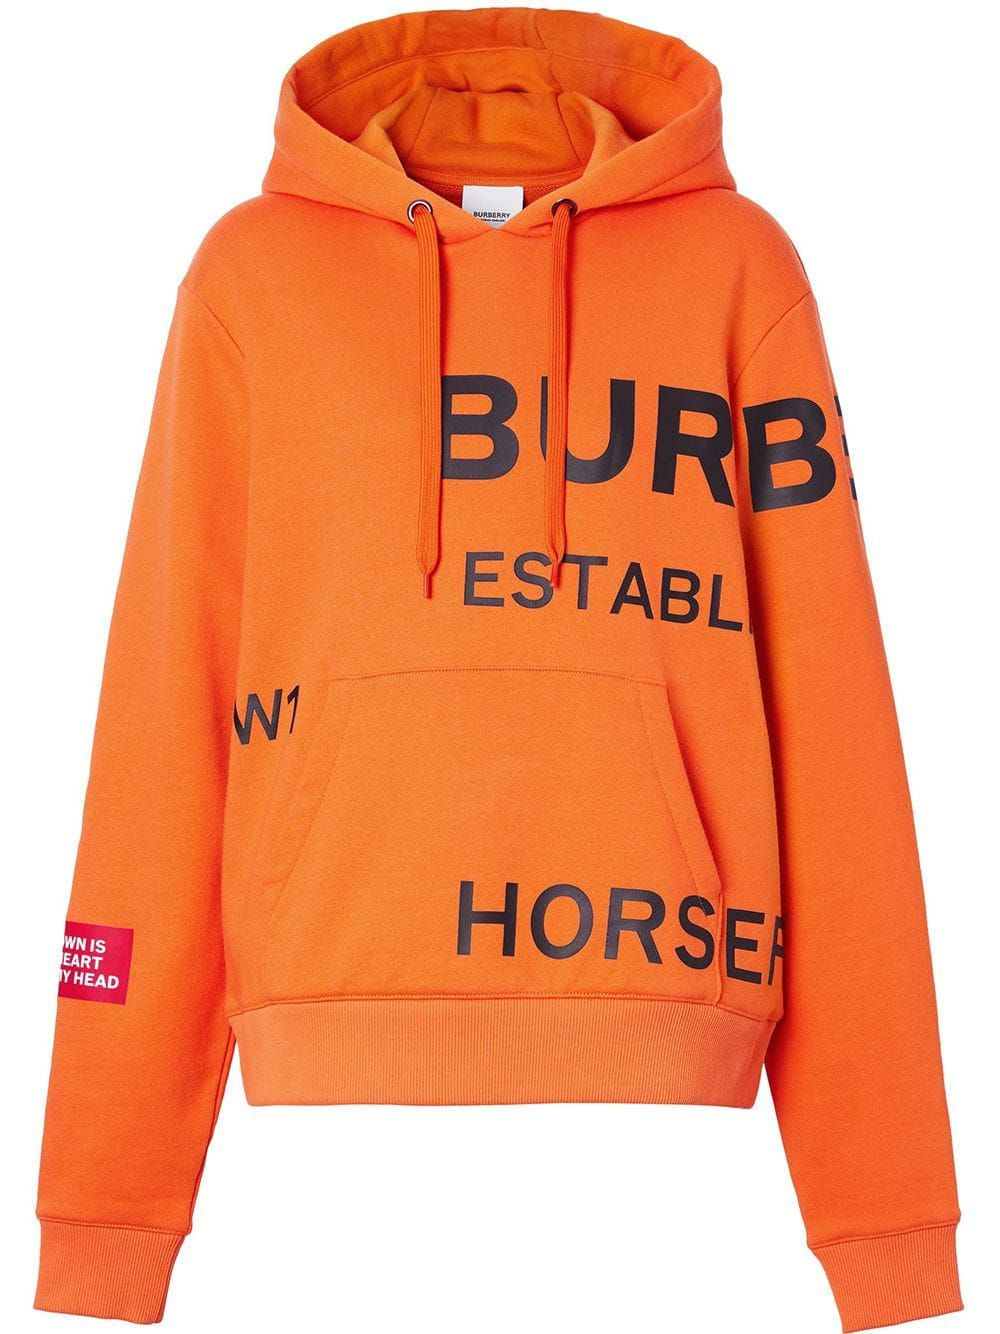 Burberry Horseferry Print Cotton Oversized Hoodie Farfetch Oversize Hoodie Hoodies Sweatshirt Street Style [ 1334 x 1000 Pixel ]